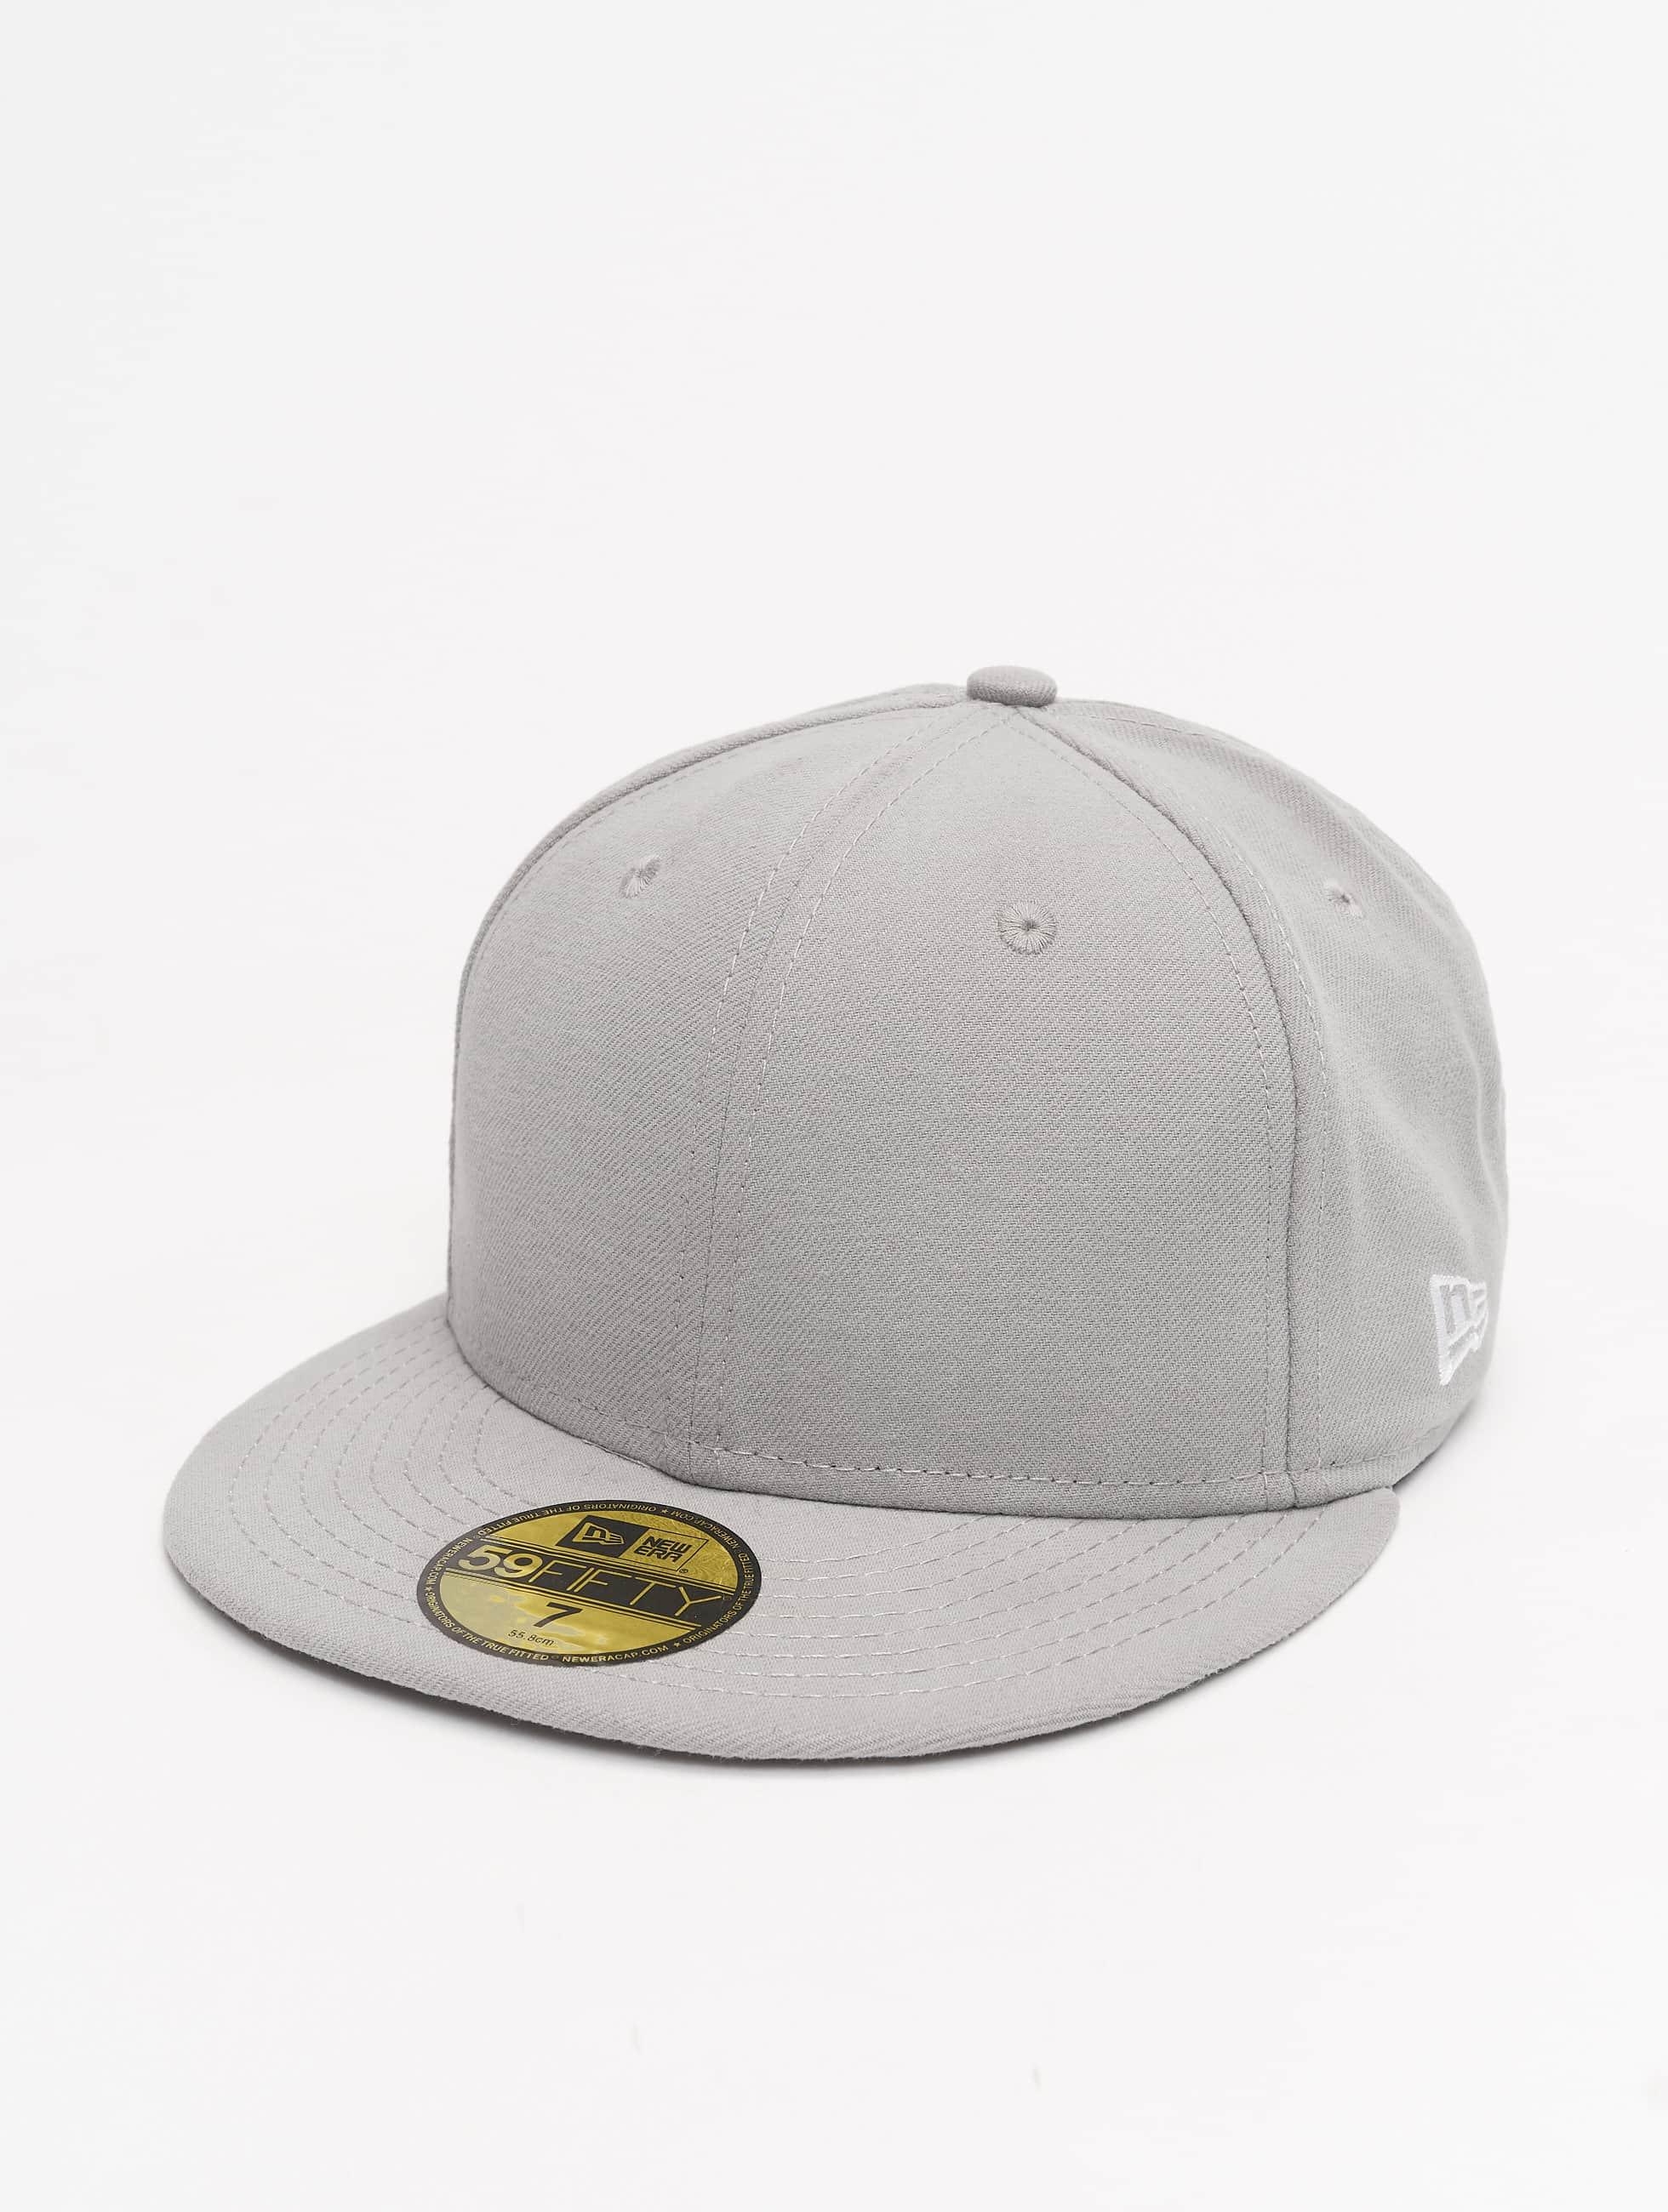 New Era Fitted Cap Original Basic 59Fifty grijs